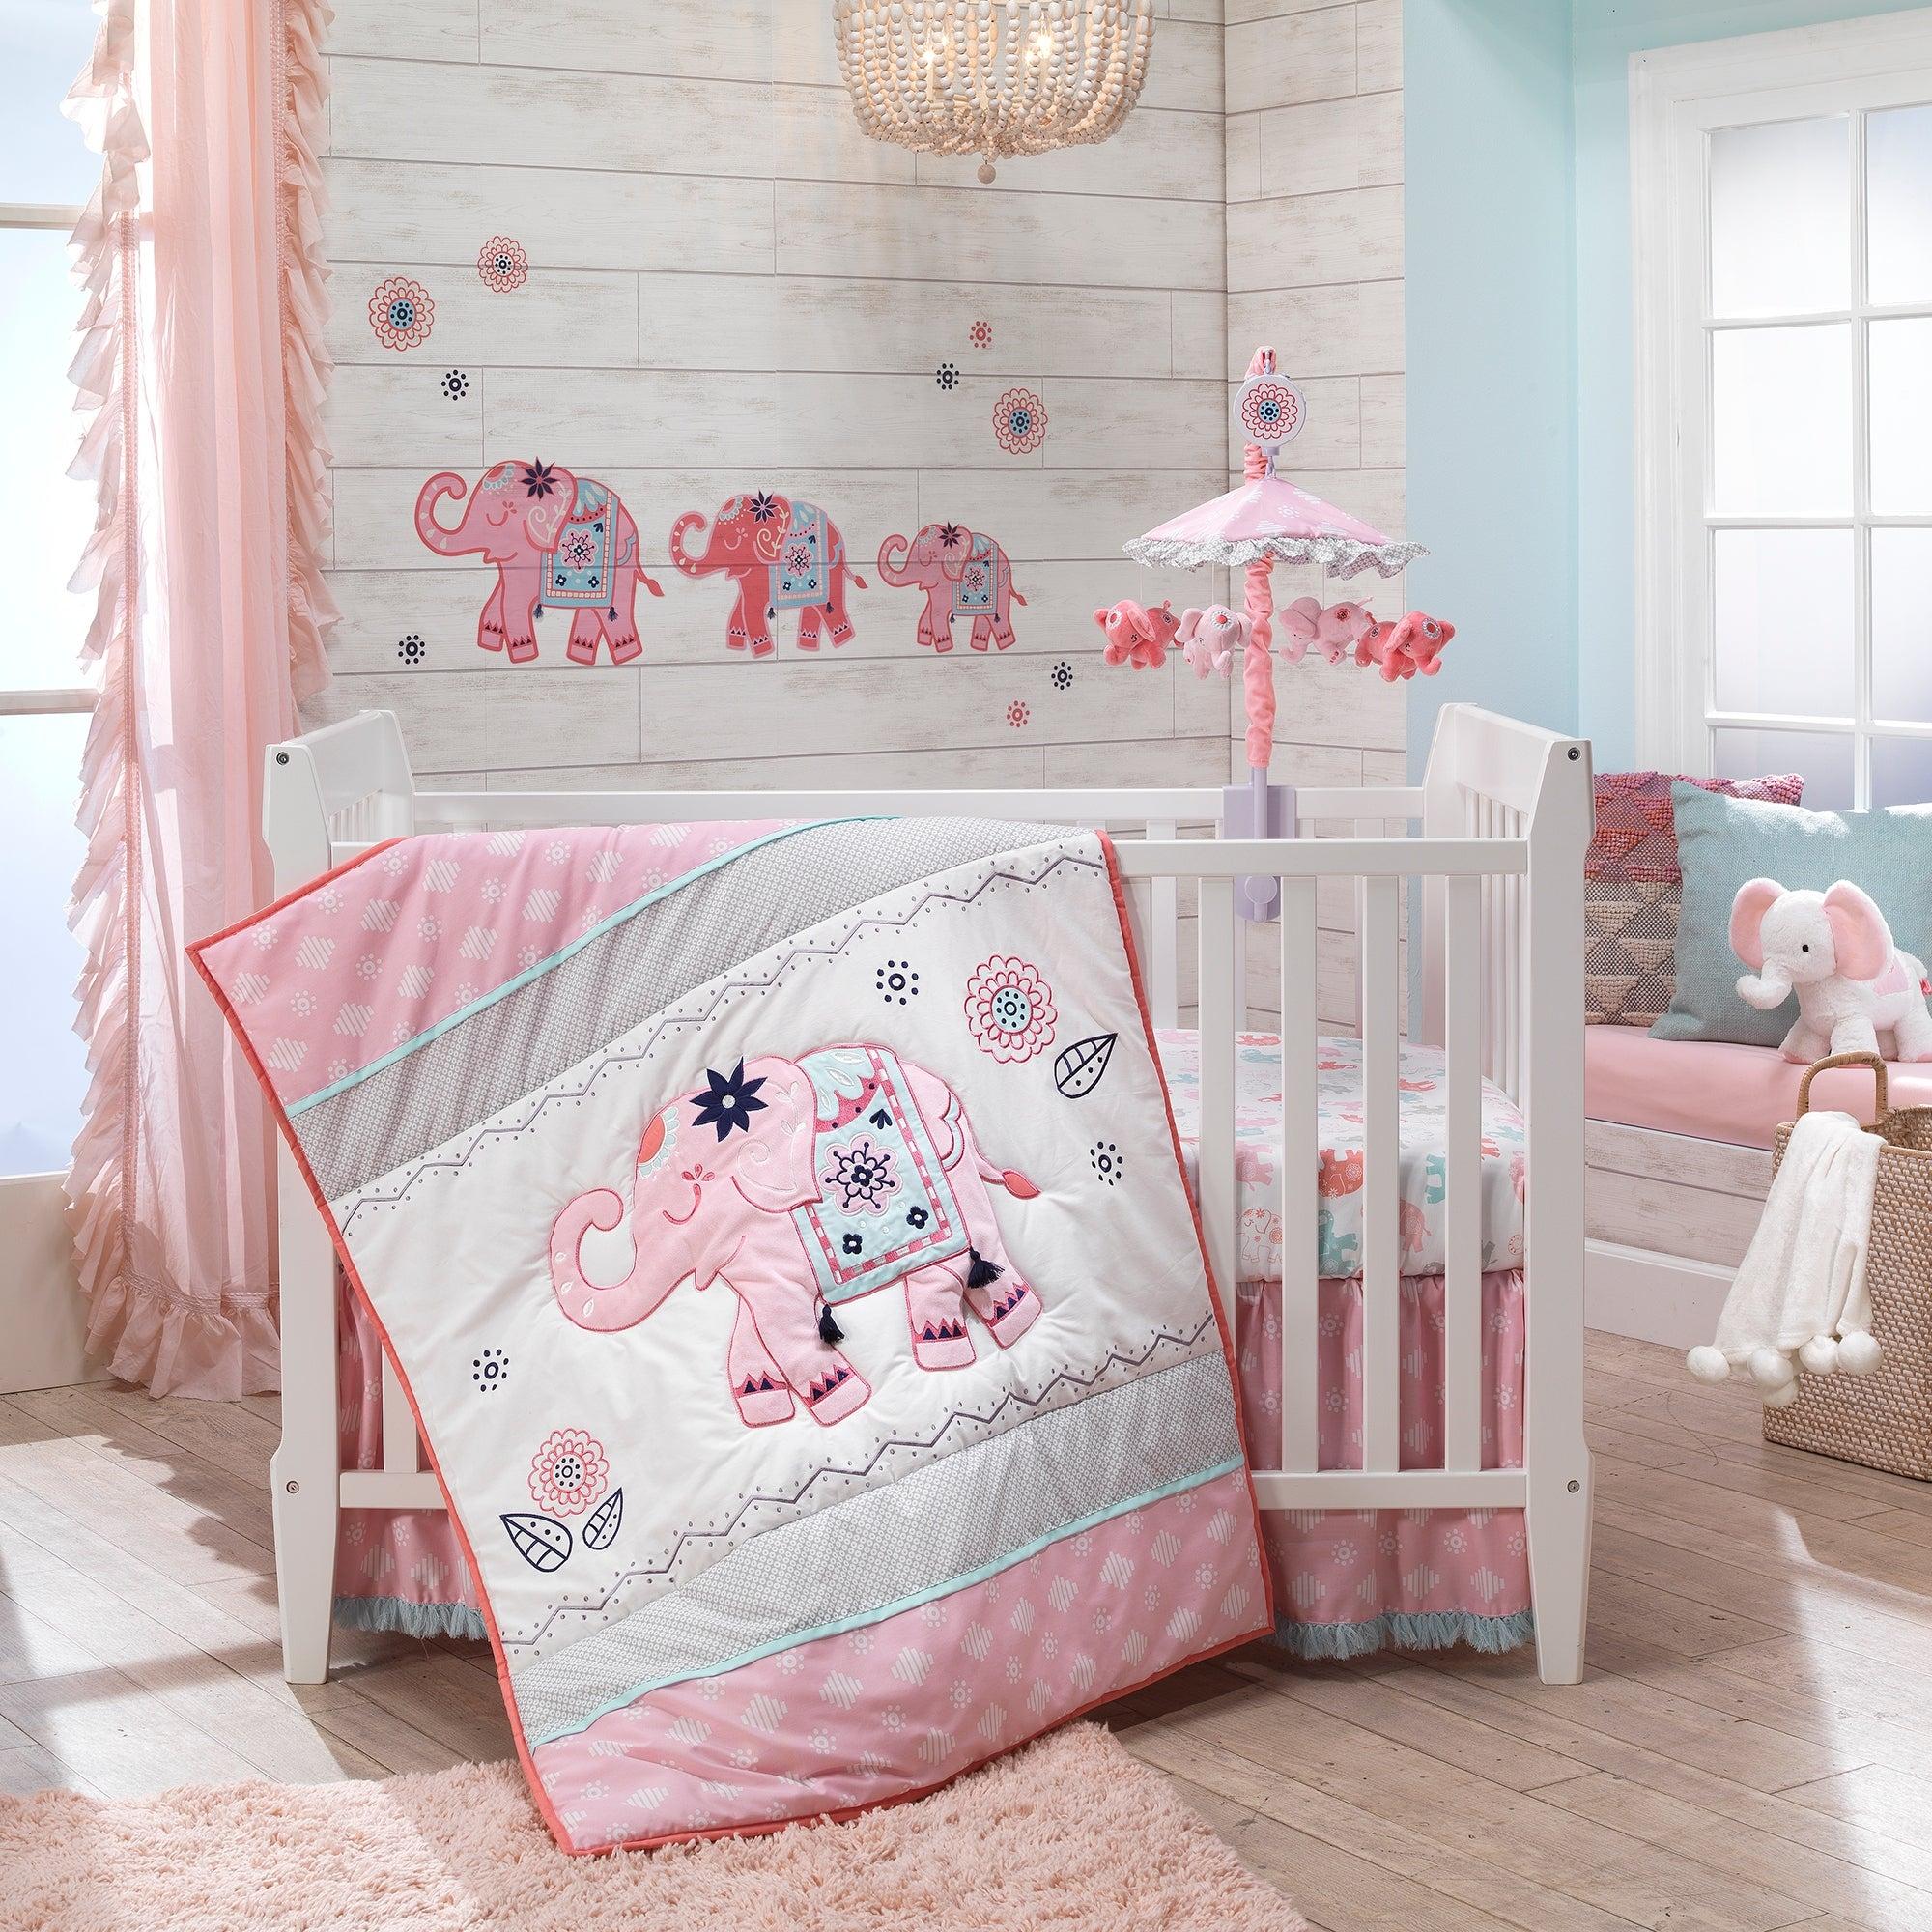 Lambs Ivy Boho Elephant Pink Gray White Nursery 5 Piece Baby Crib Bedding Set